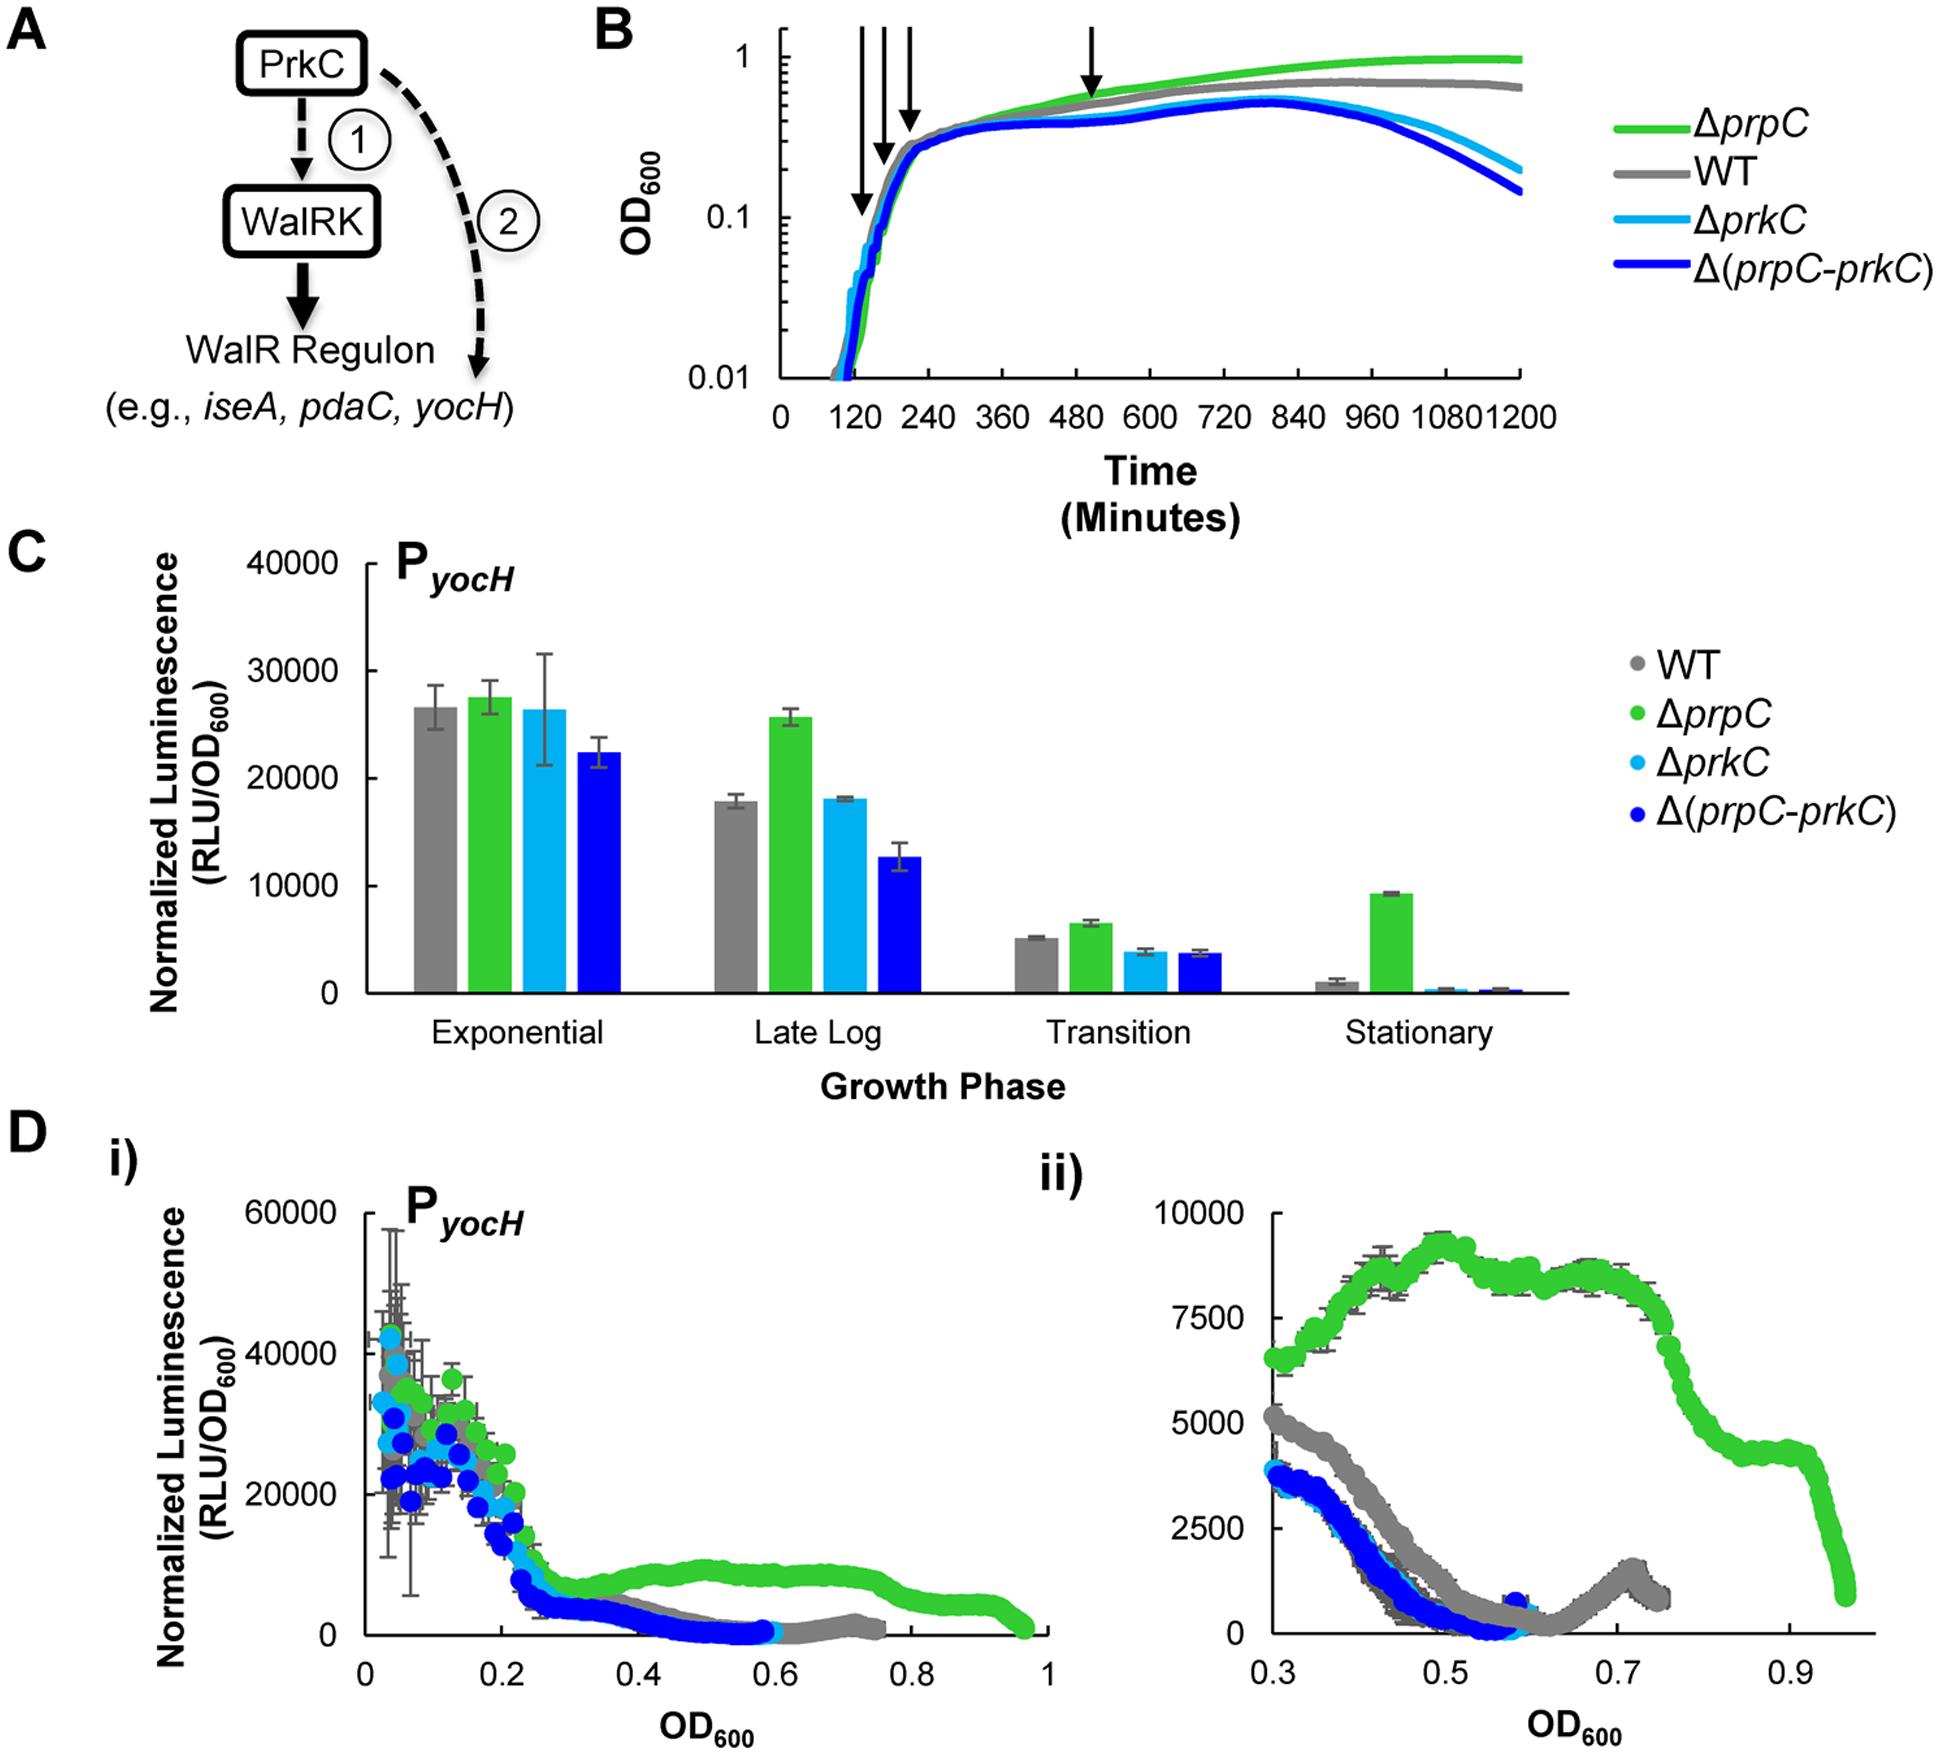 The kinase PrkC and the phosphatase PrpC regulate the WalRK regulon gene <i>yocH</i>.